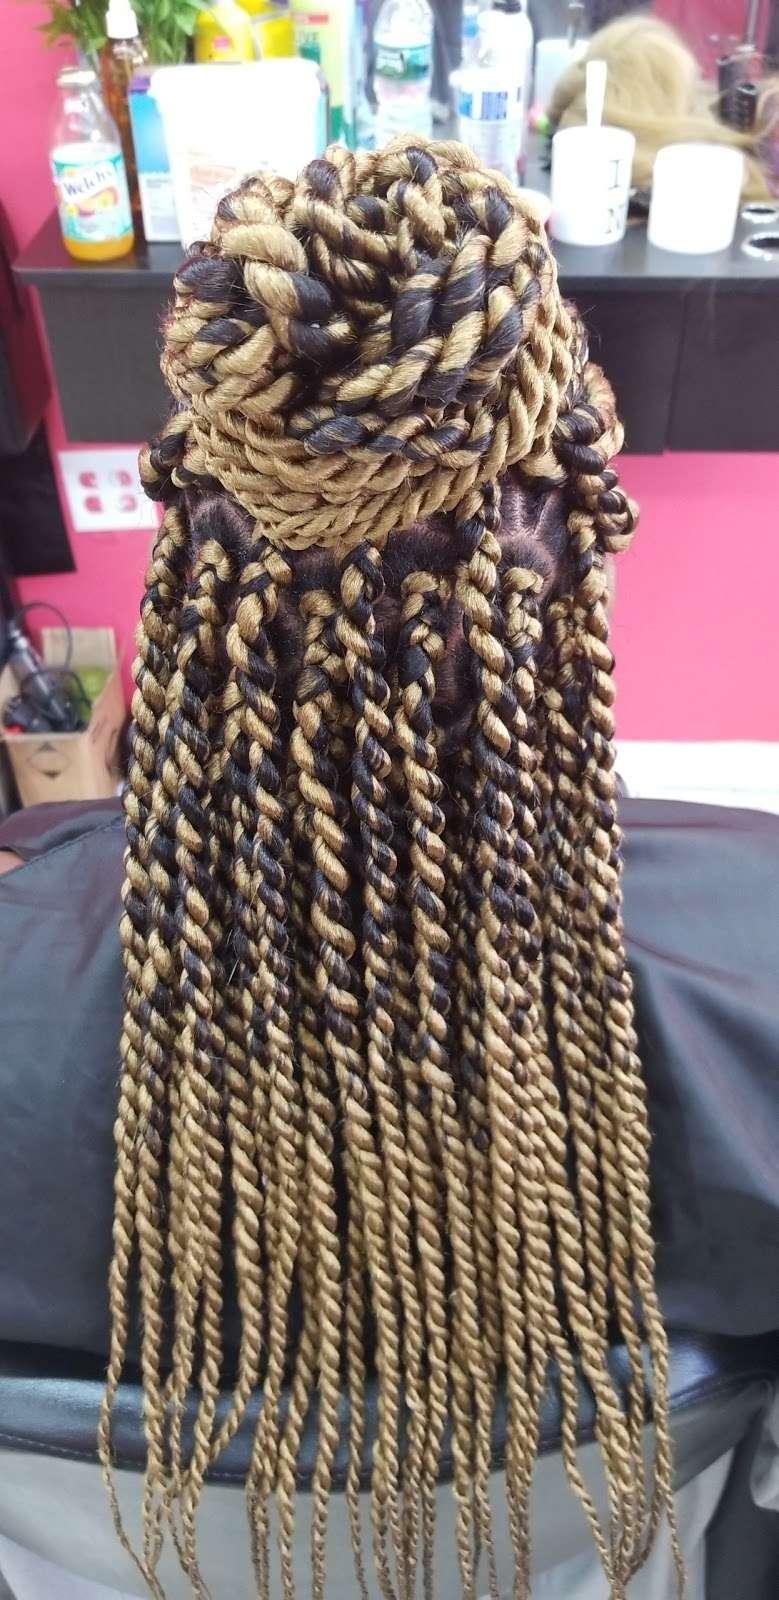 Mama African Hair Braiding - hair care  | Photo 2 of 10 | Address: 162 Rockaway Ave, Brooklyn, NY 11233, USA | Phone: (718) 635-1543